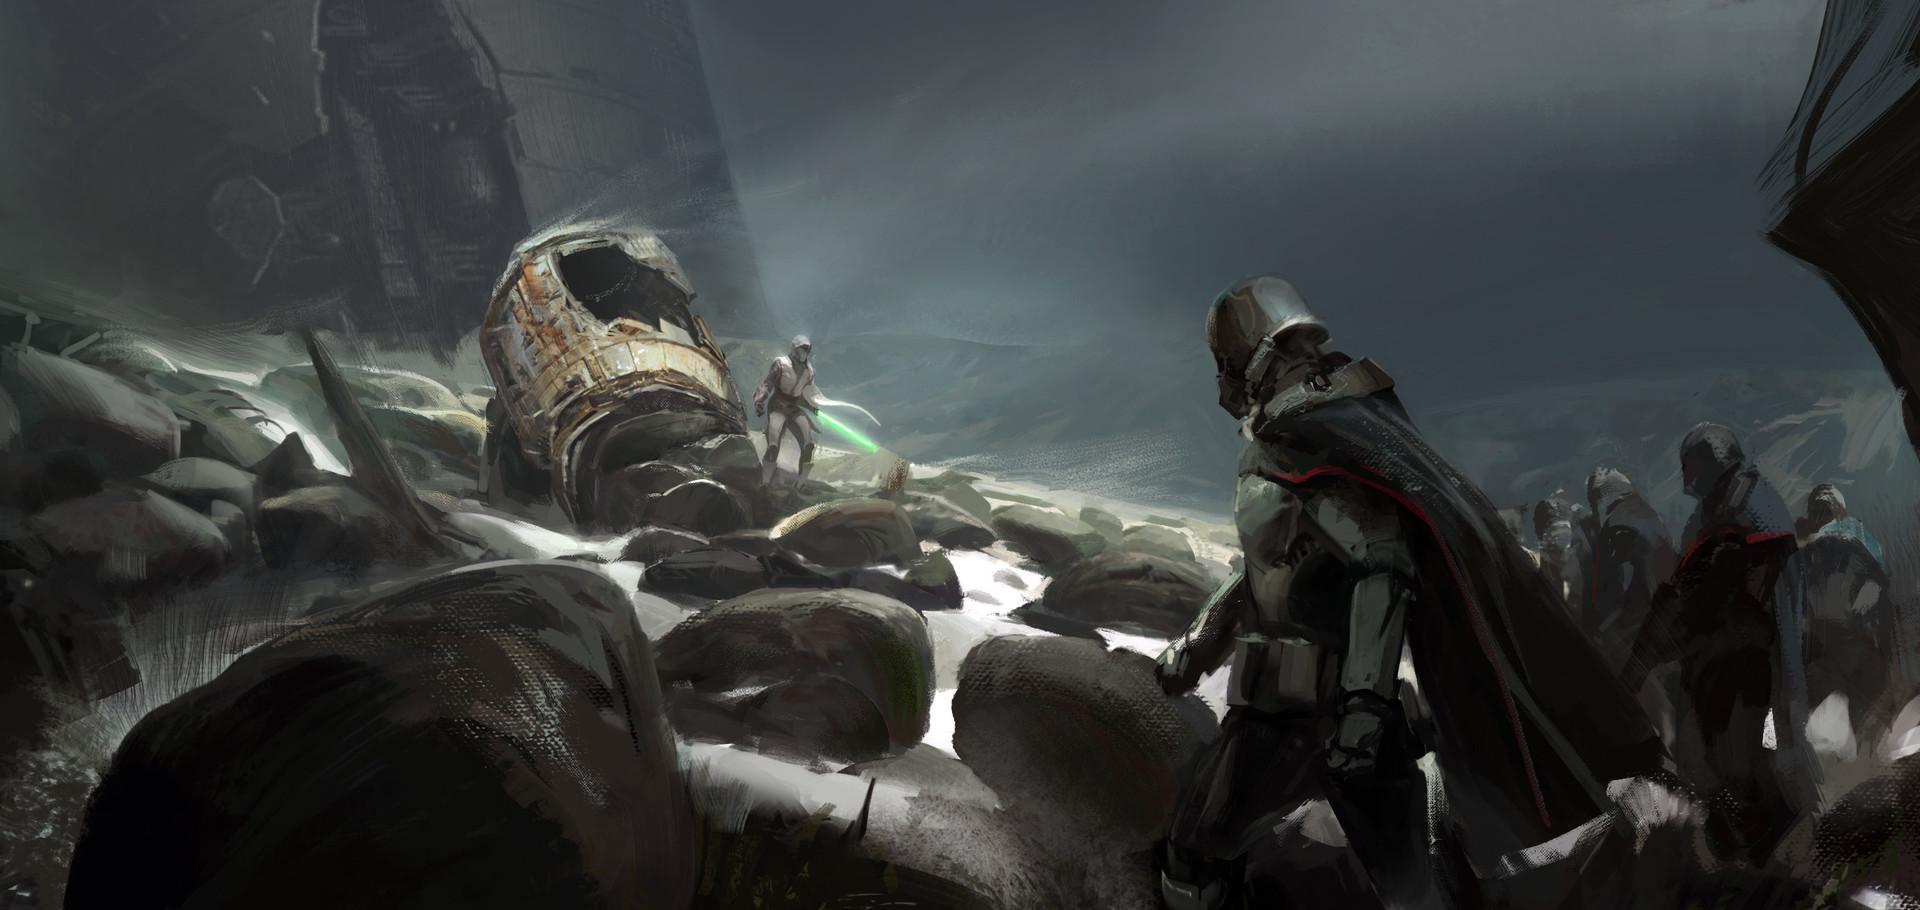 Star Wars Concept Art And Illustrations Ii Concept Art World